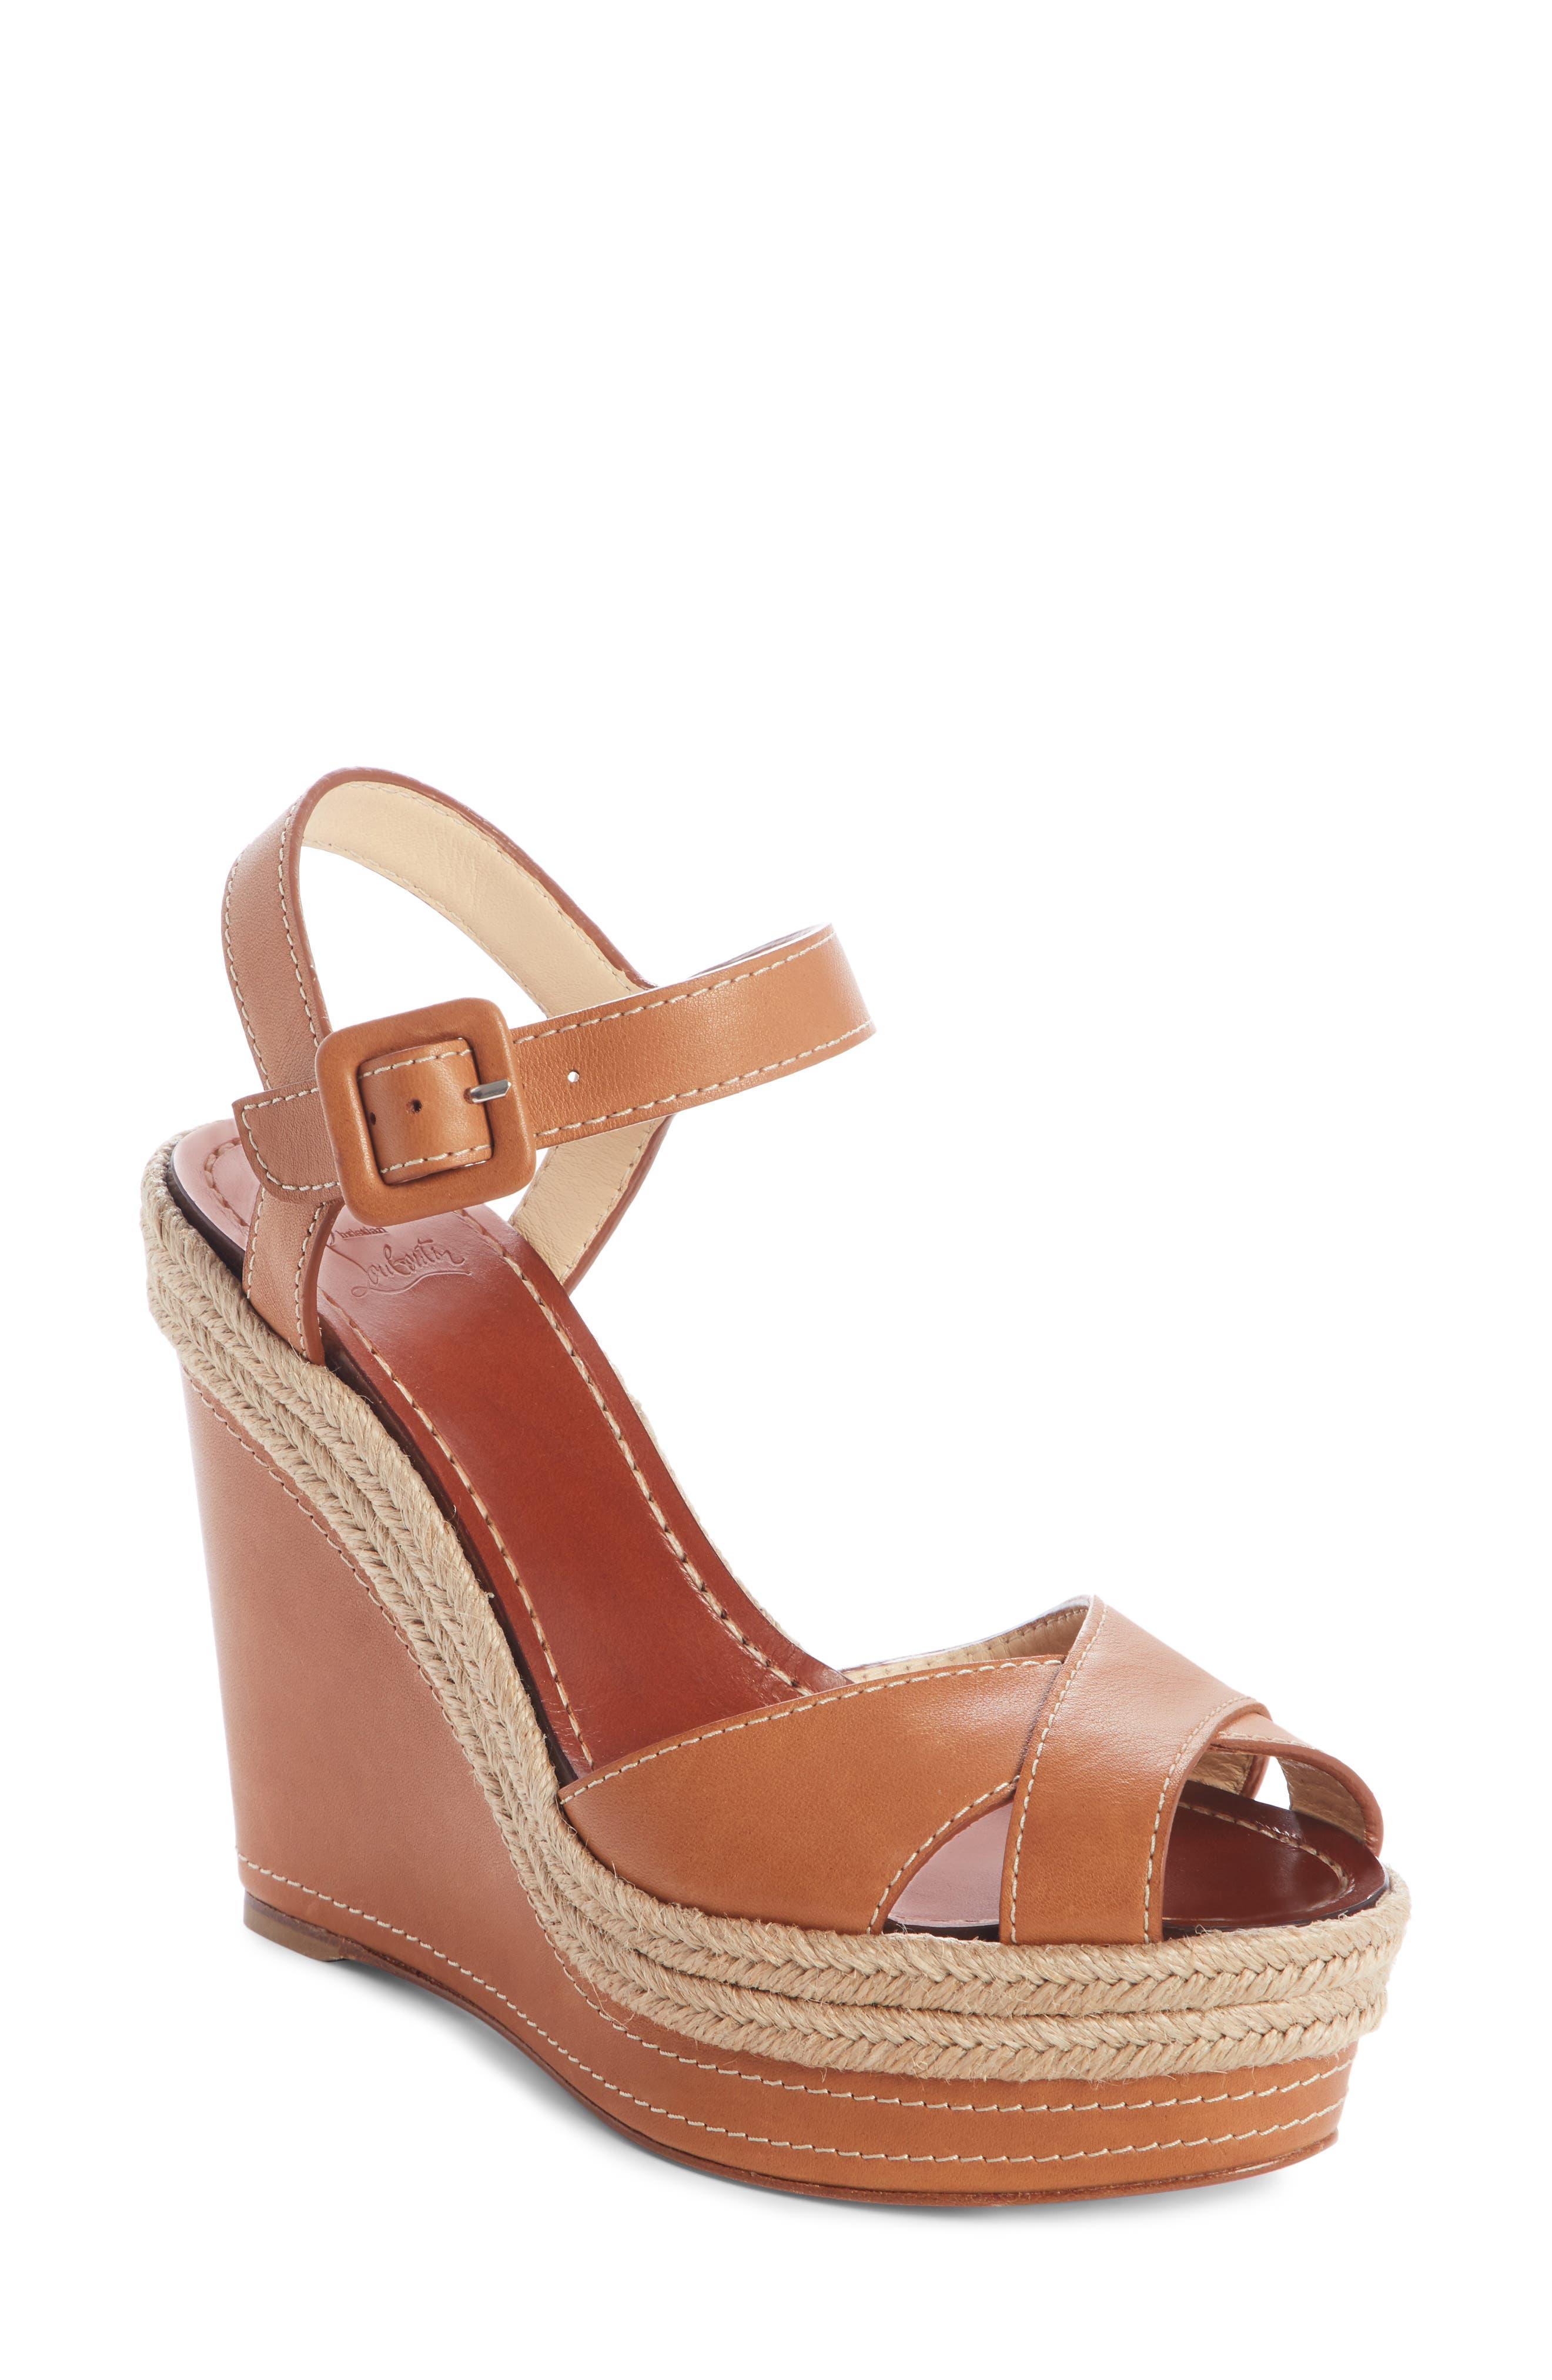 Almeria 120 Espadrille Wedge Sandals in Cuoio Brown